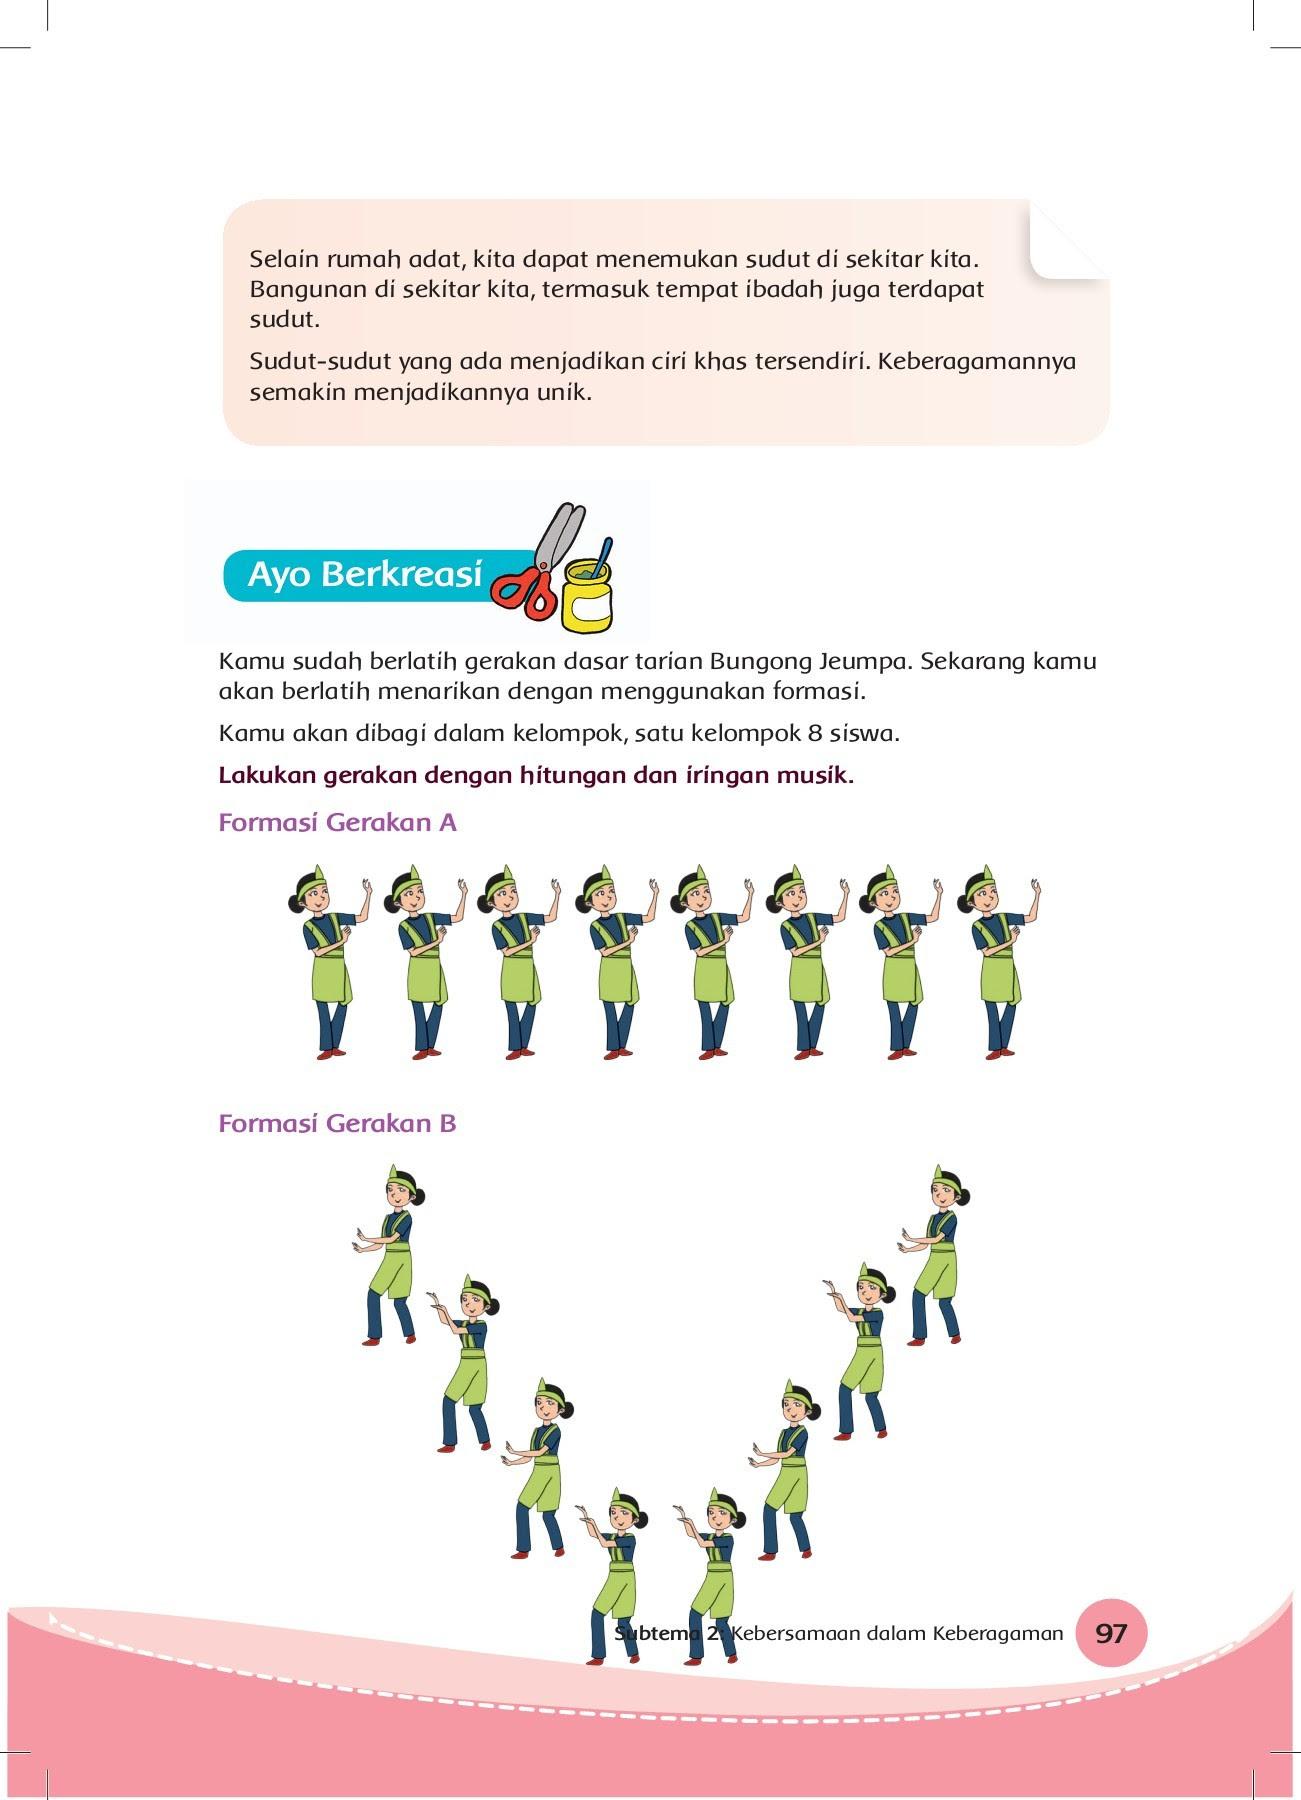 Bagaimana Cara Melakukan Gerakan Tari Bungong Jeumpa Pada Posisi Berdiri : bagaimana, melakukan, gerakan, bungong, jeumpa, posisi, berdiri, Bungong, Jeumpa, Biasanya, Ditarikan, Secara